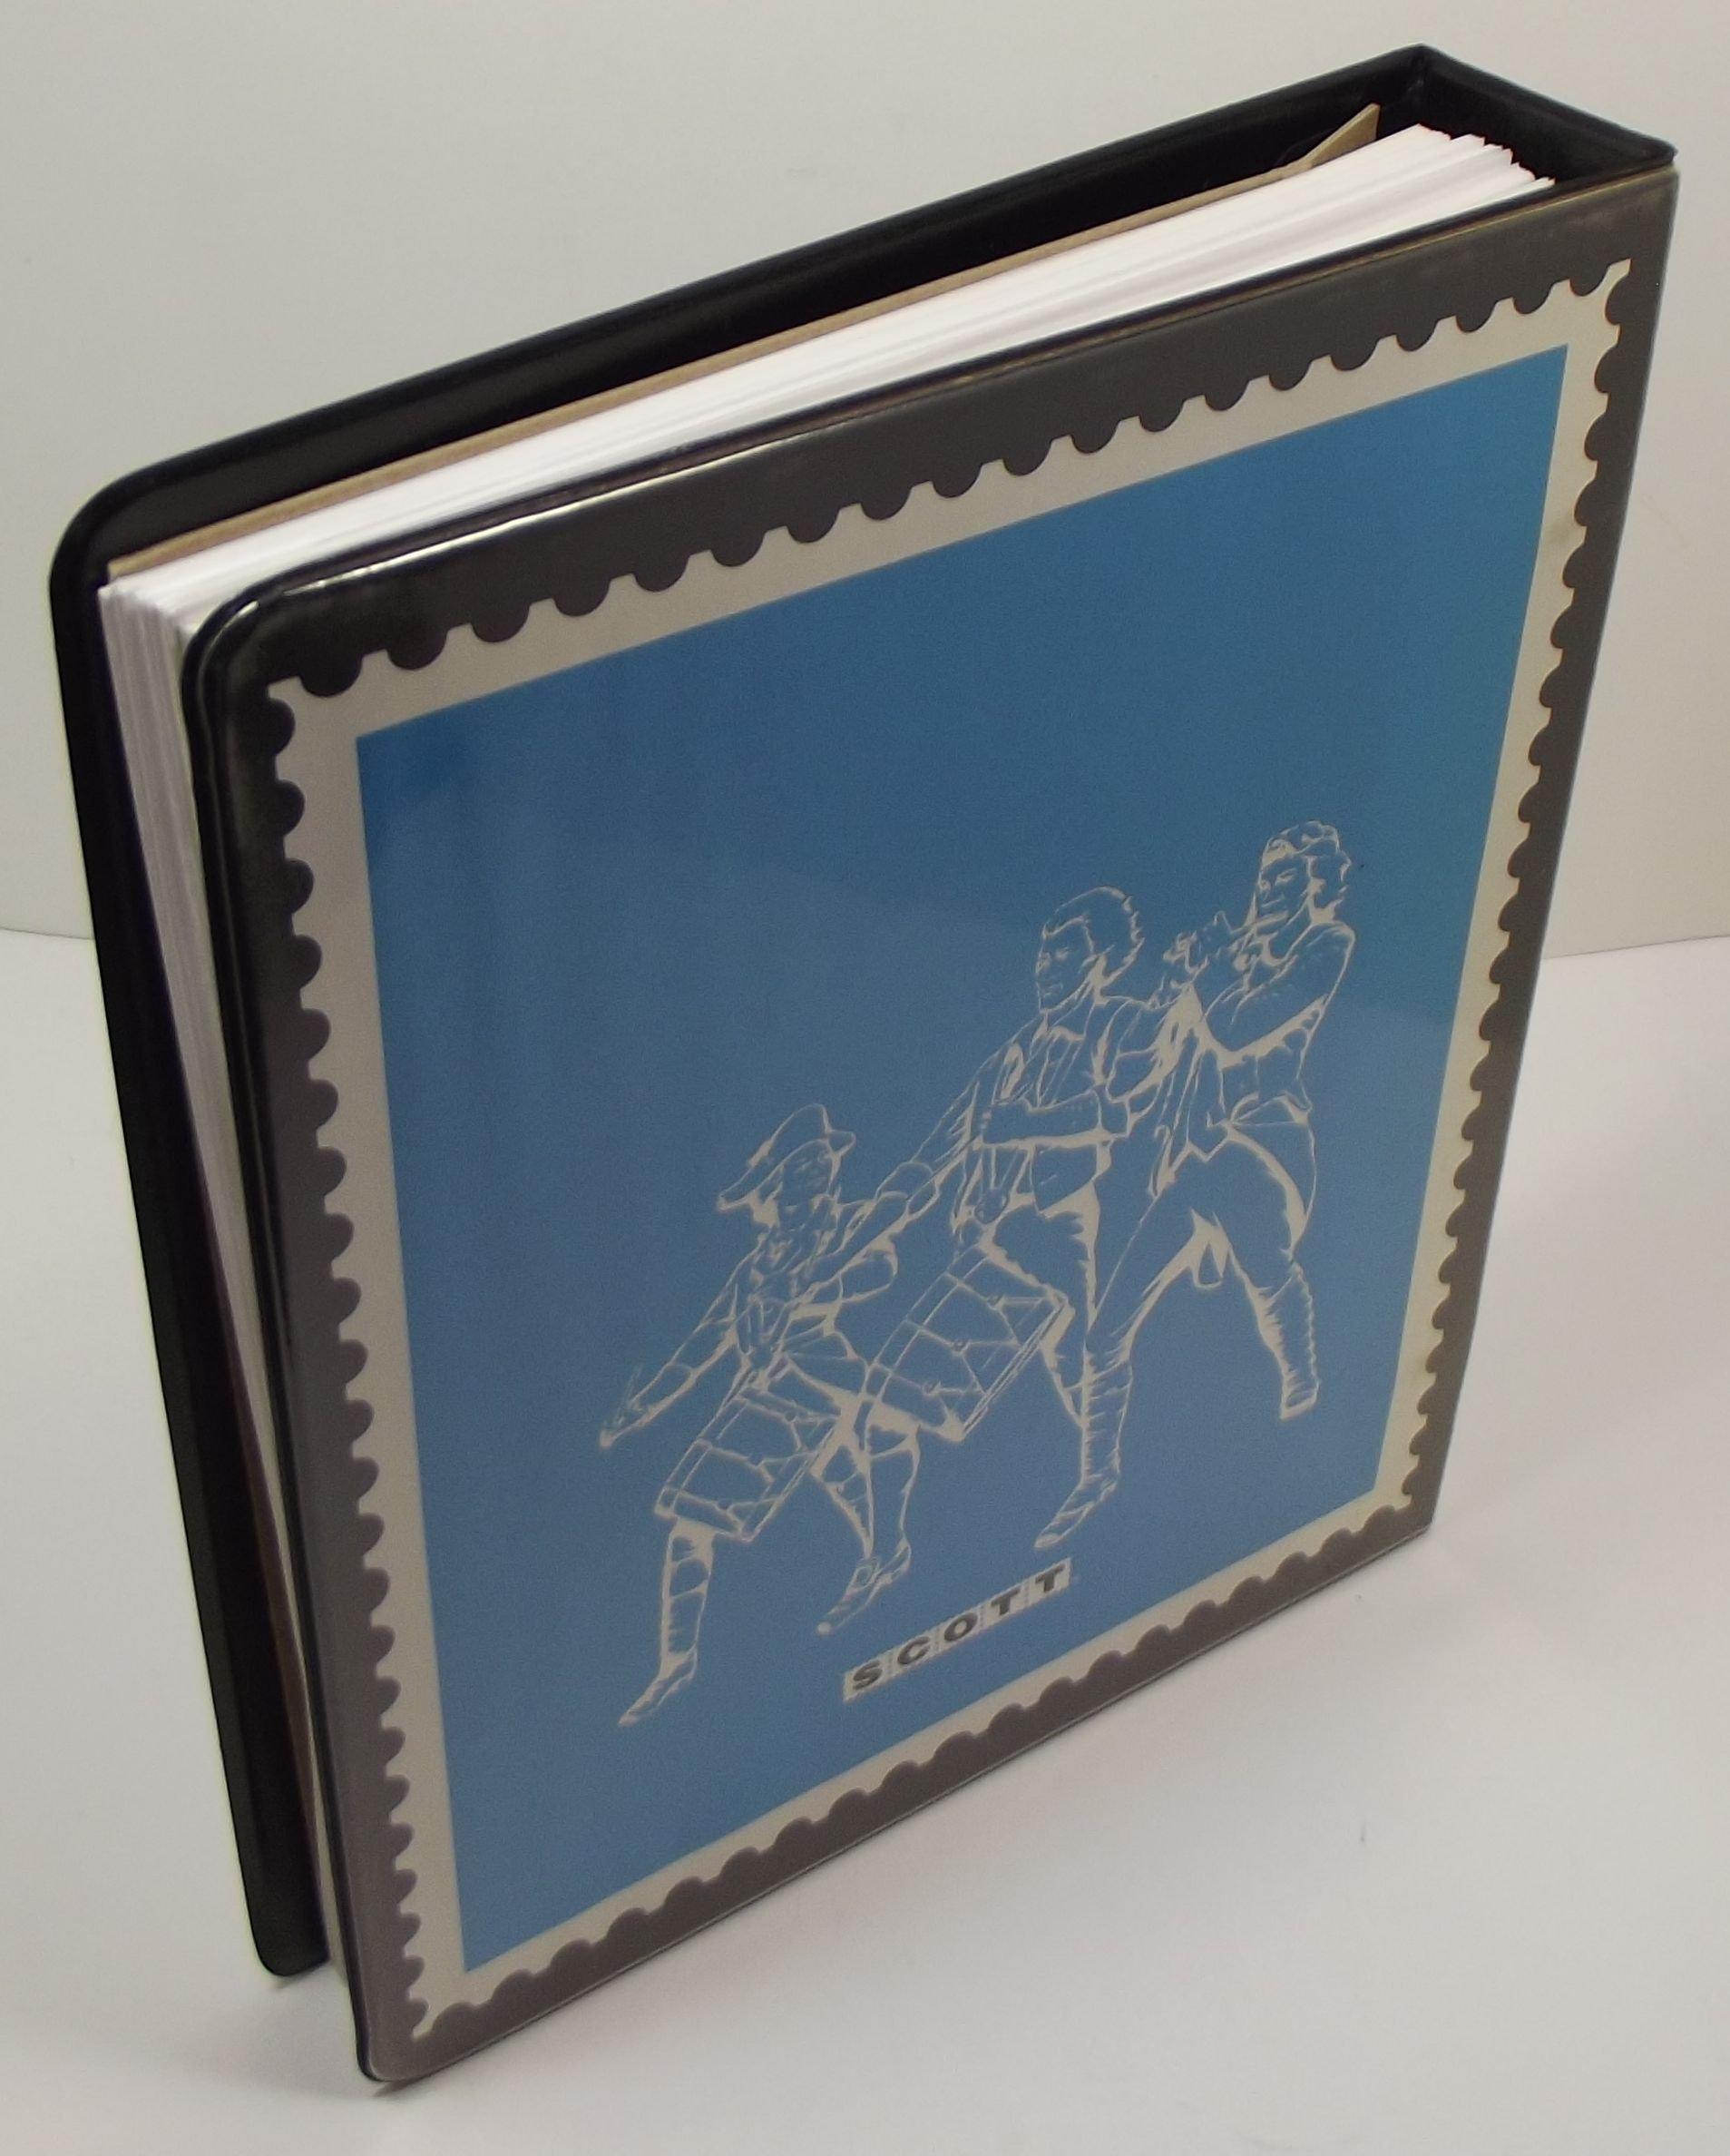 Scott Minuteman Stamp Album 180AMM0 (United States): Sott